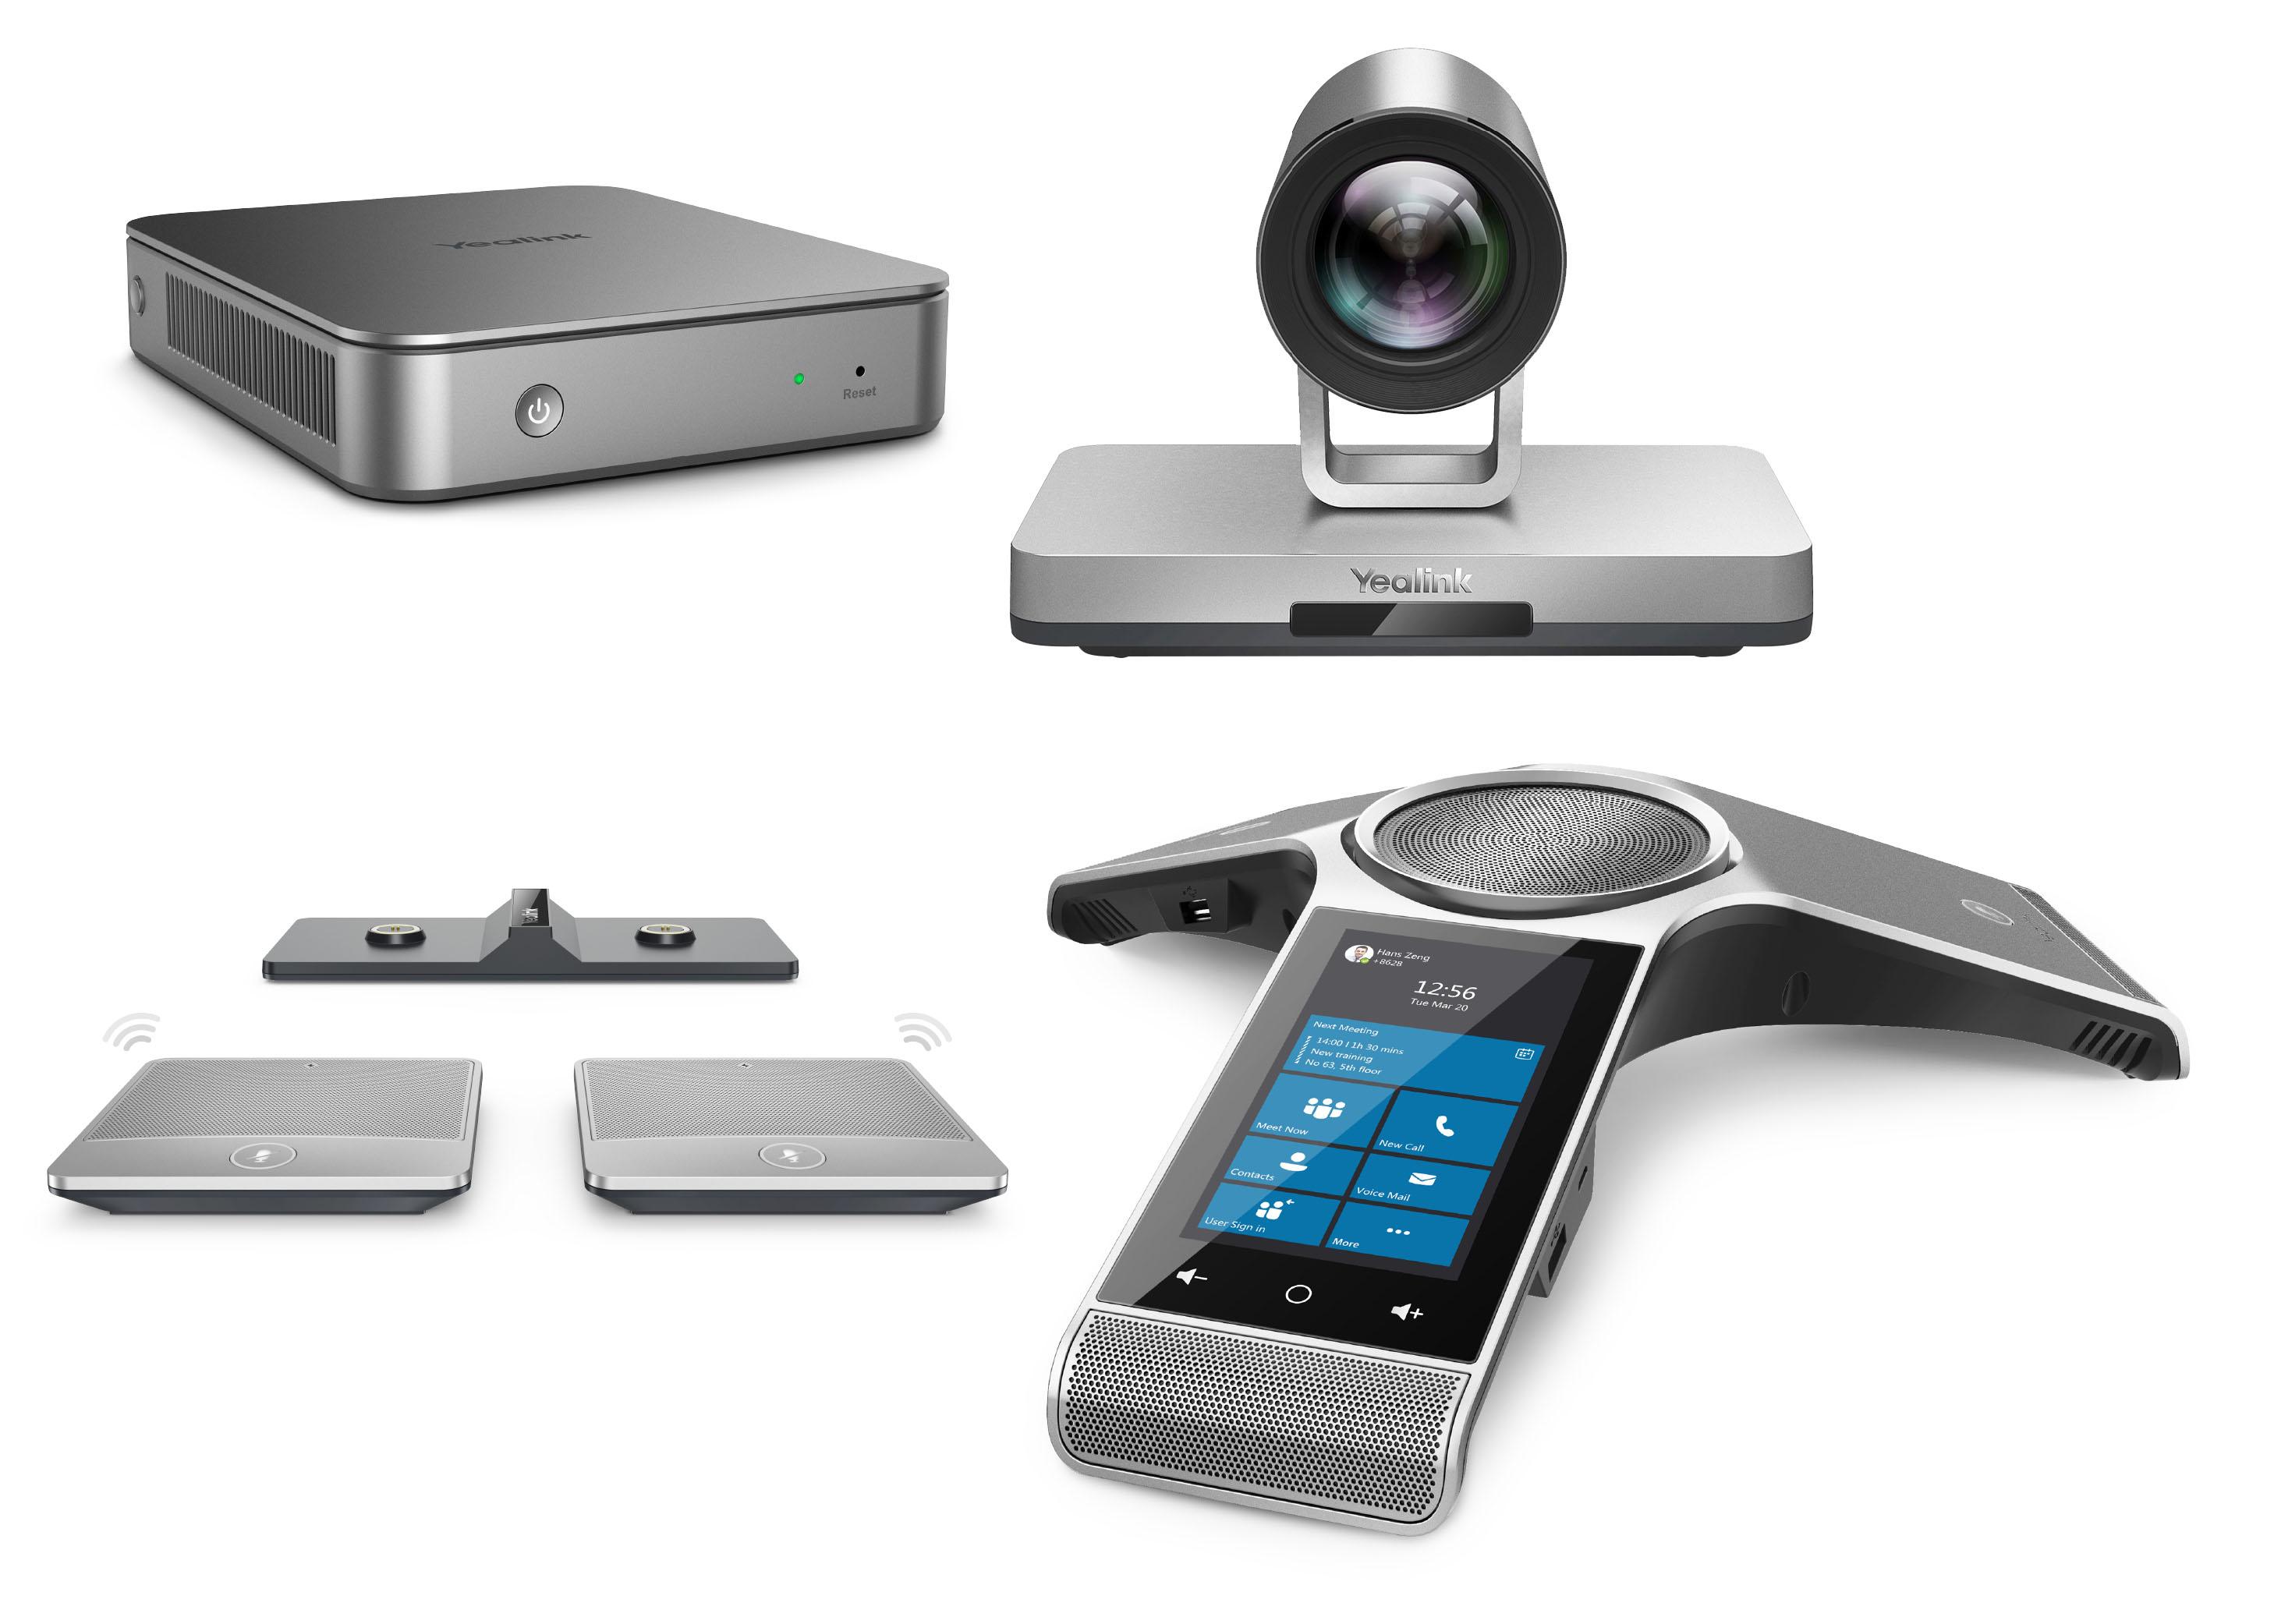 ZVC800- UVC80 12X optical USB PTZ camera MCore mini-PC- 1x CP960-Zoom- 2x CPW90 -Windows 10 IoT Enterprise OS and license